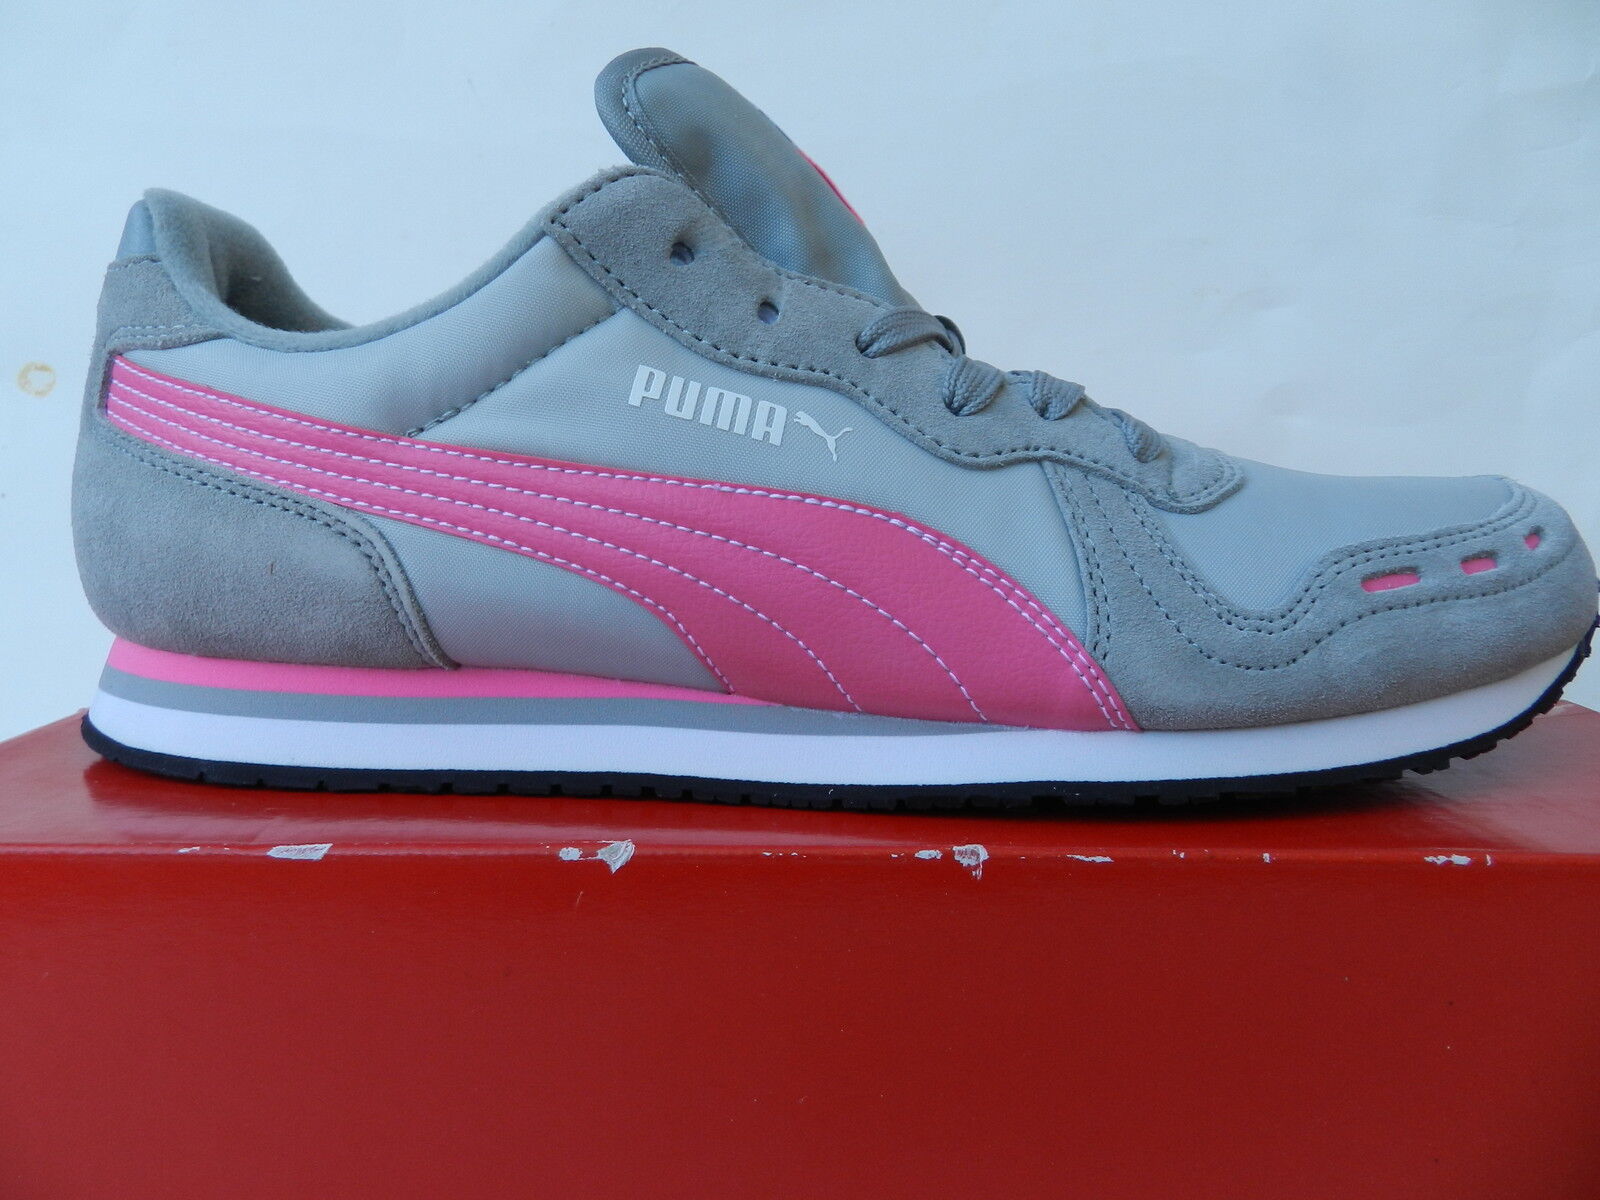 Puma Cabana Racer II Chaussures Femme 41 Baskets Baskets 41 Tennis Retro Vintage UK5 Neuf 66ec51